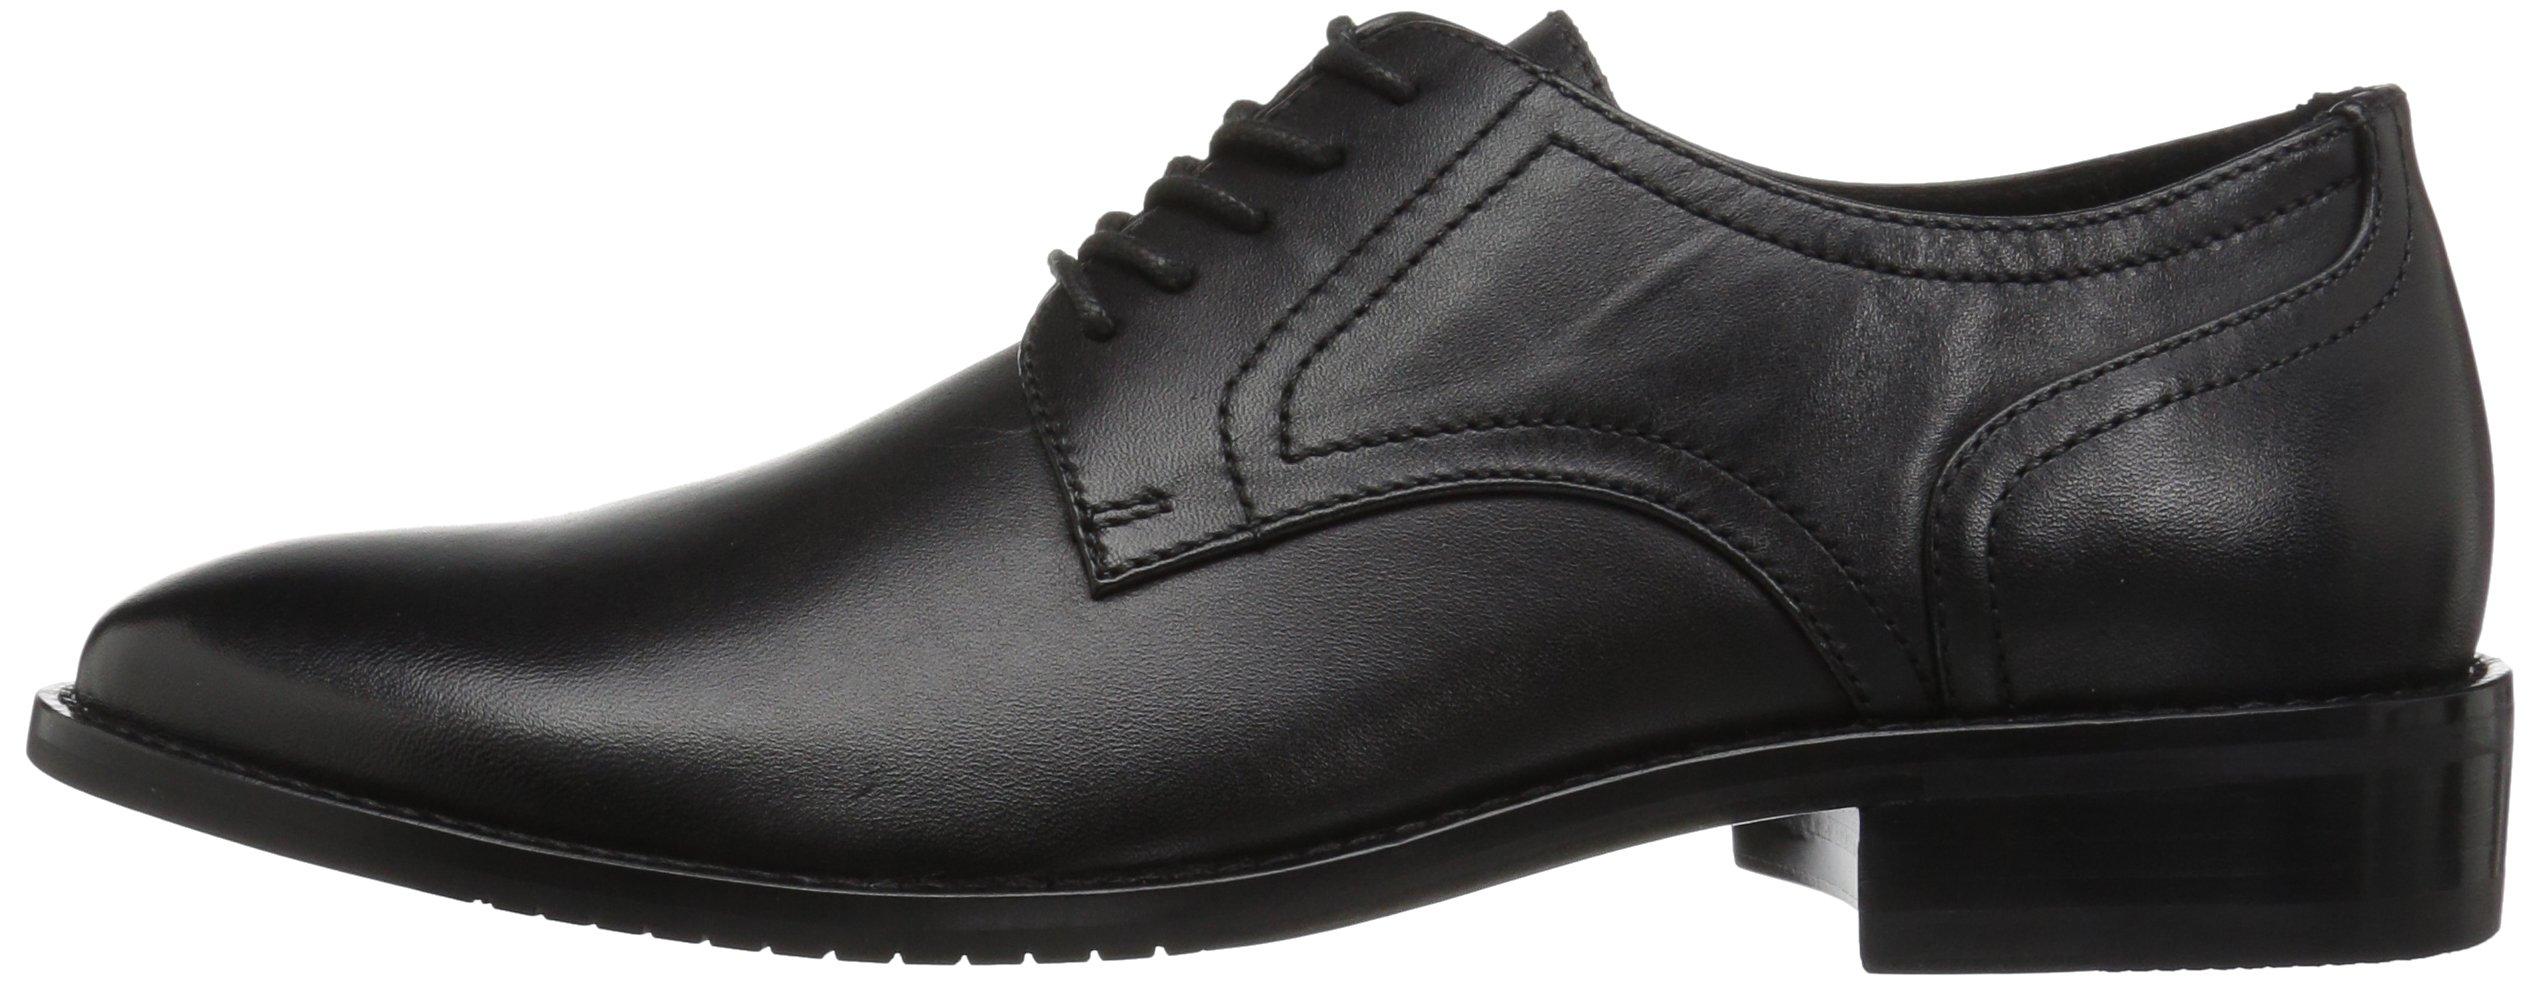 206 Collective Men's Concord Plain-Toe Oxford Shoe, Black, 13 2E US by 206 Collective (Image #5)